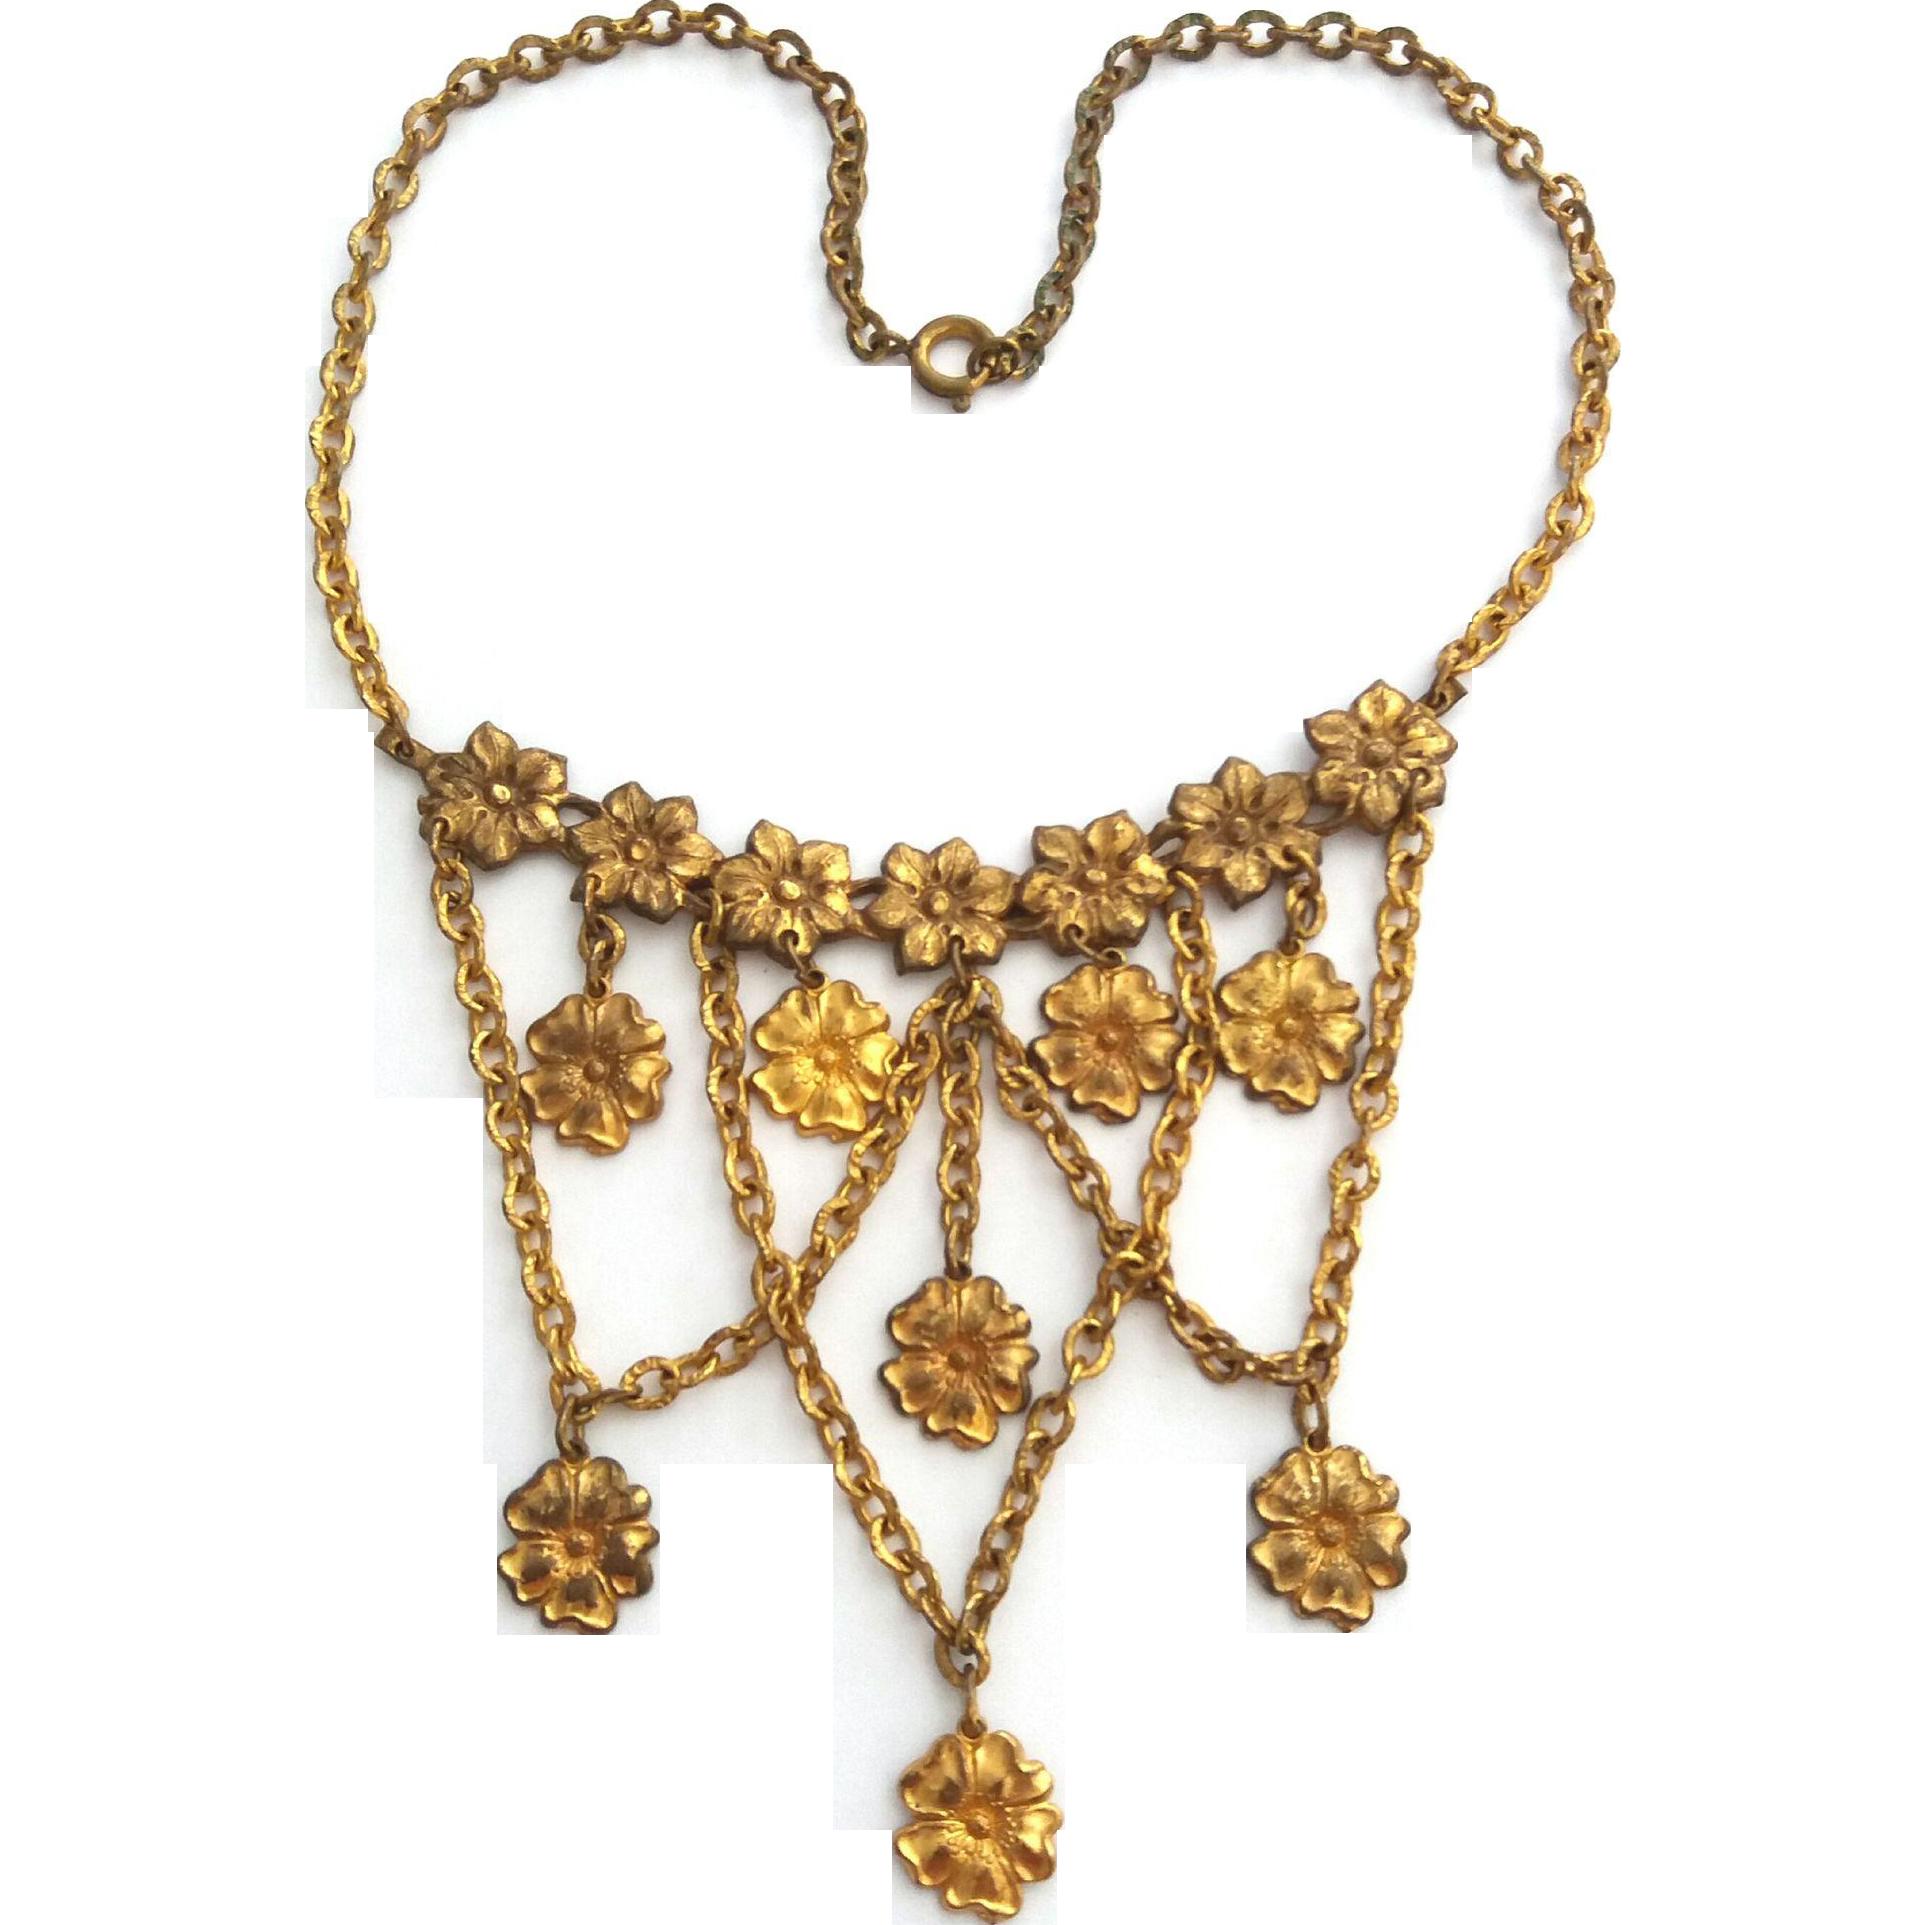 Vintage 1940's Flower Festoon Bib Necklace